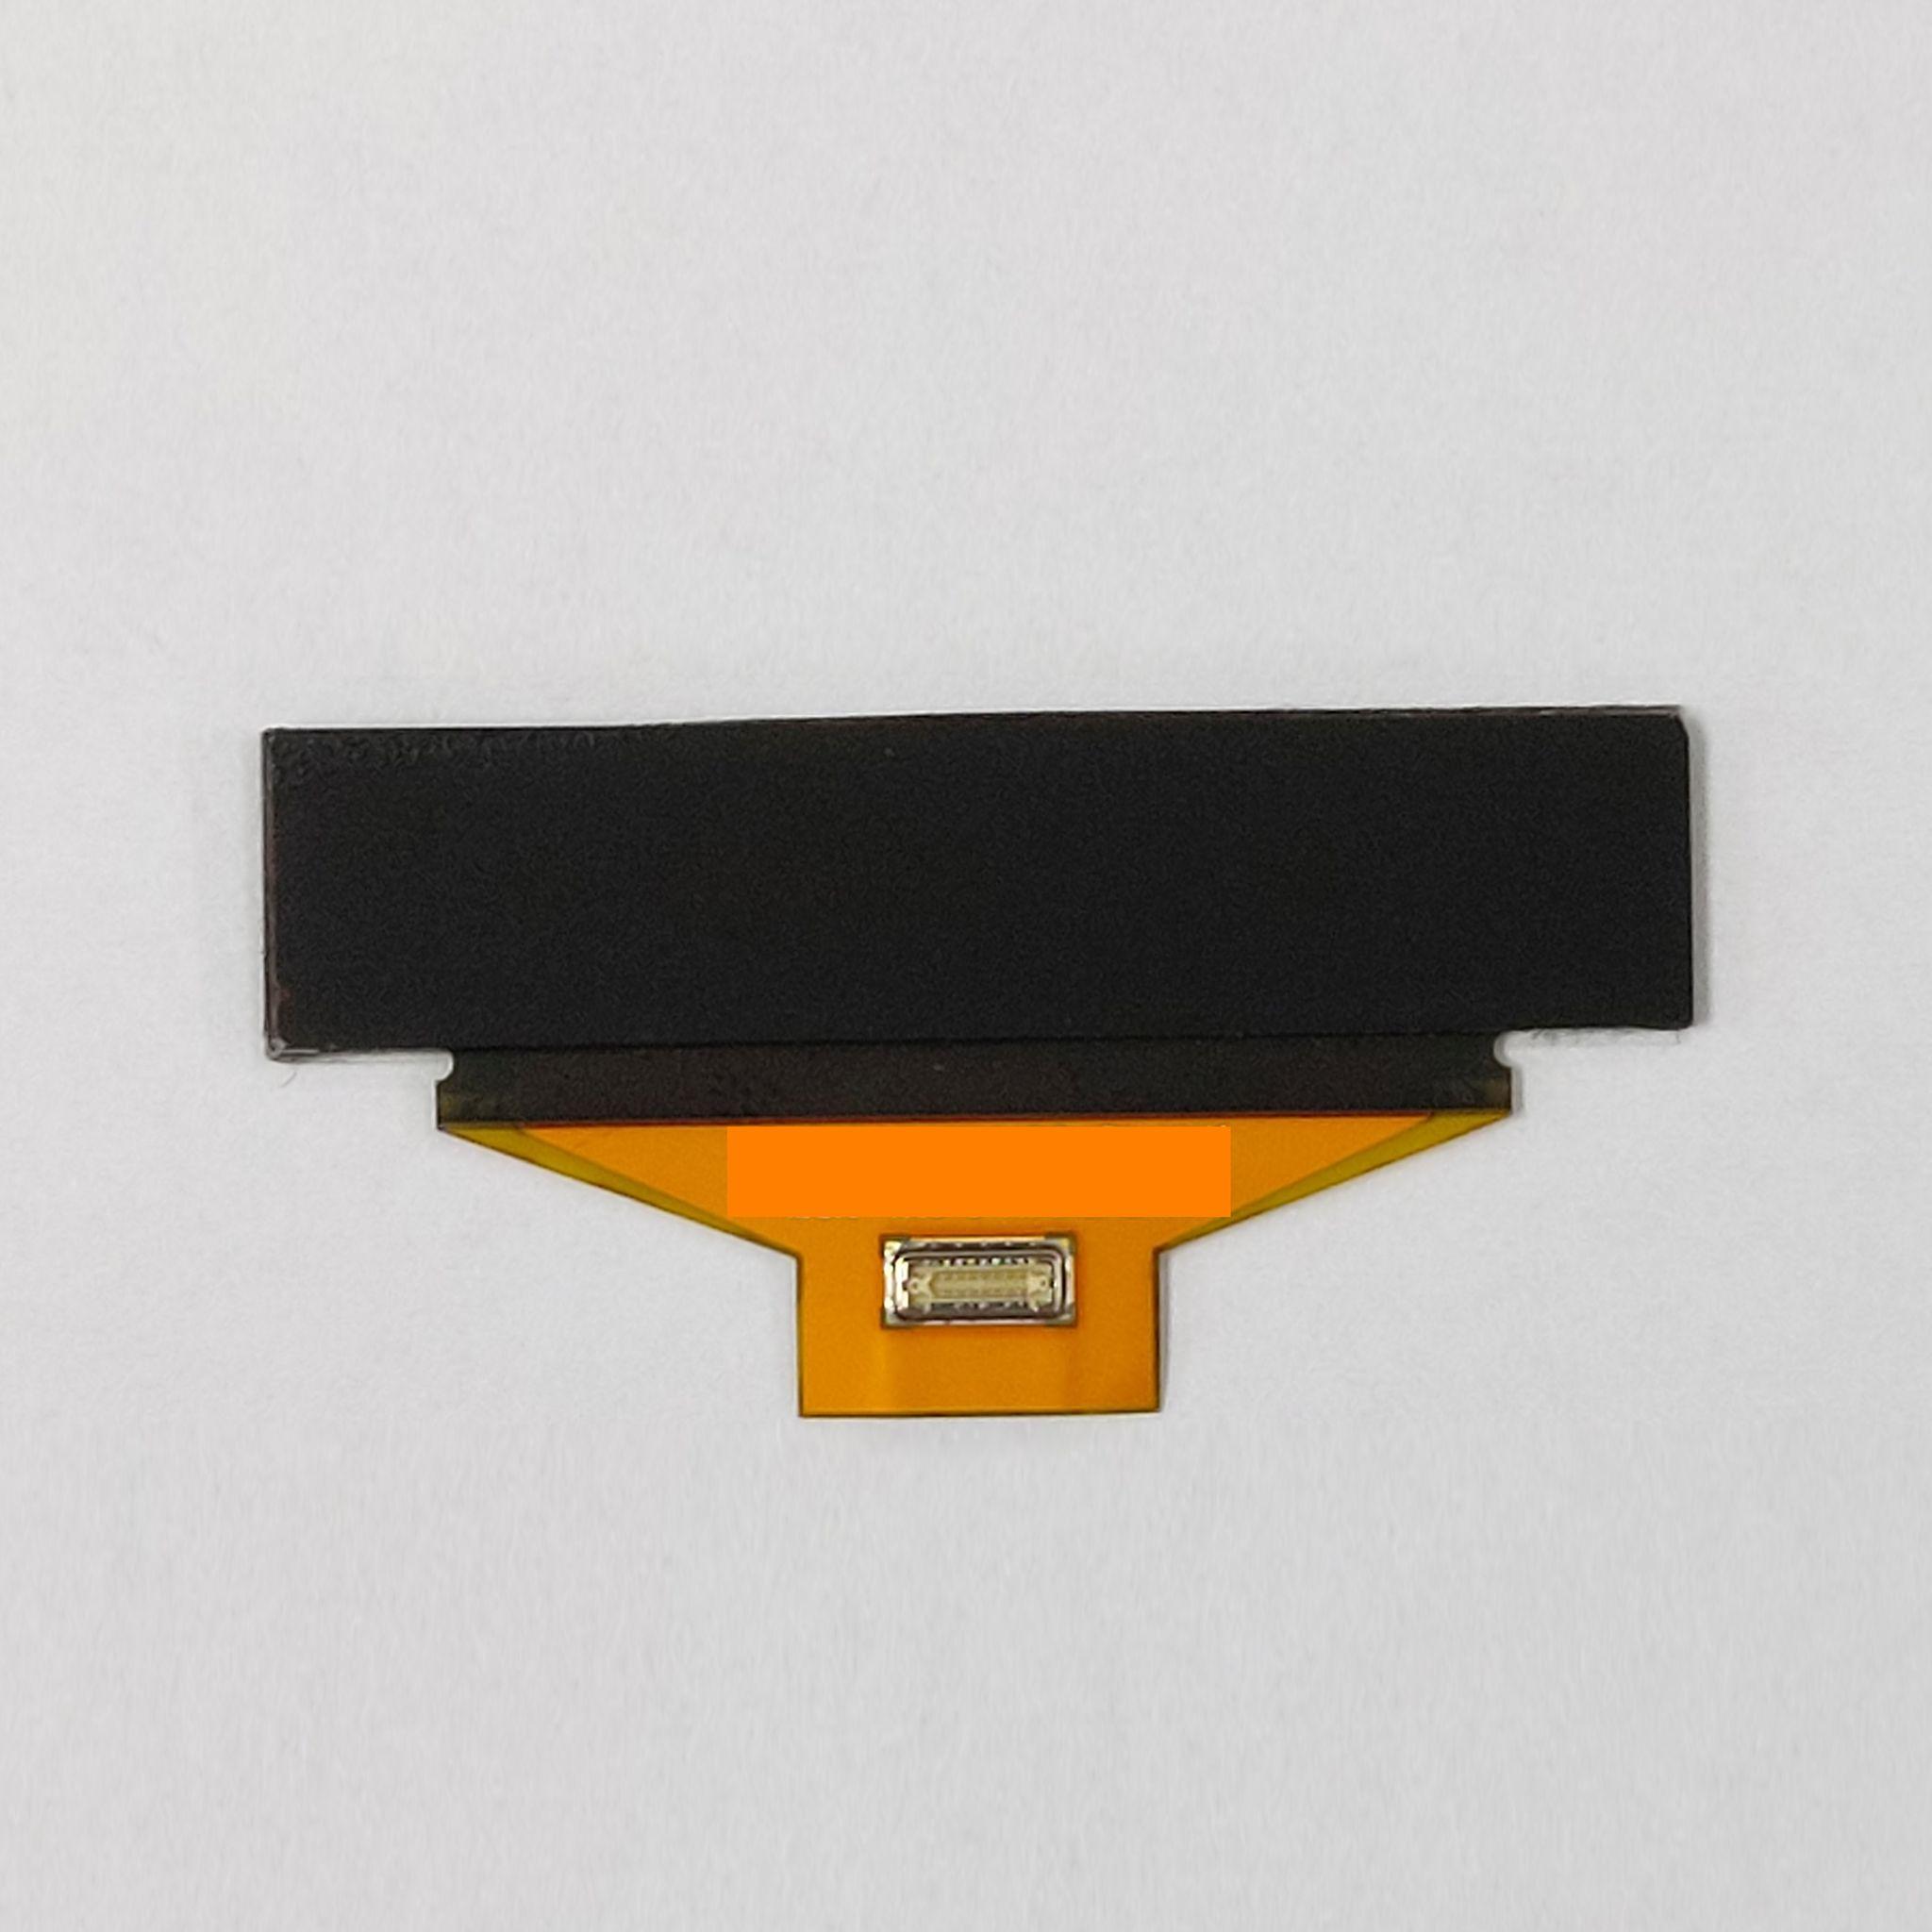 Low-Profile Film Antenna